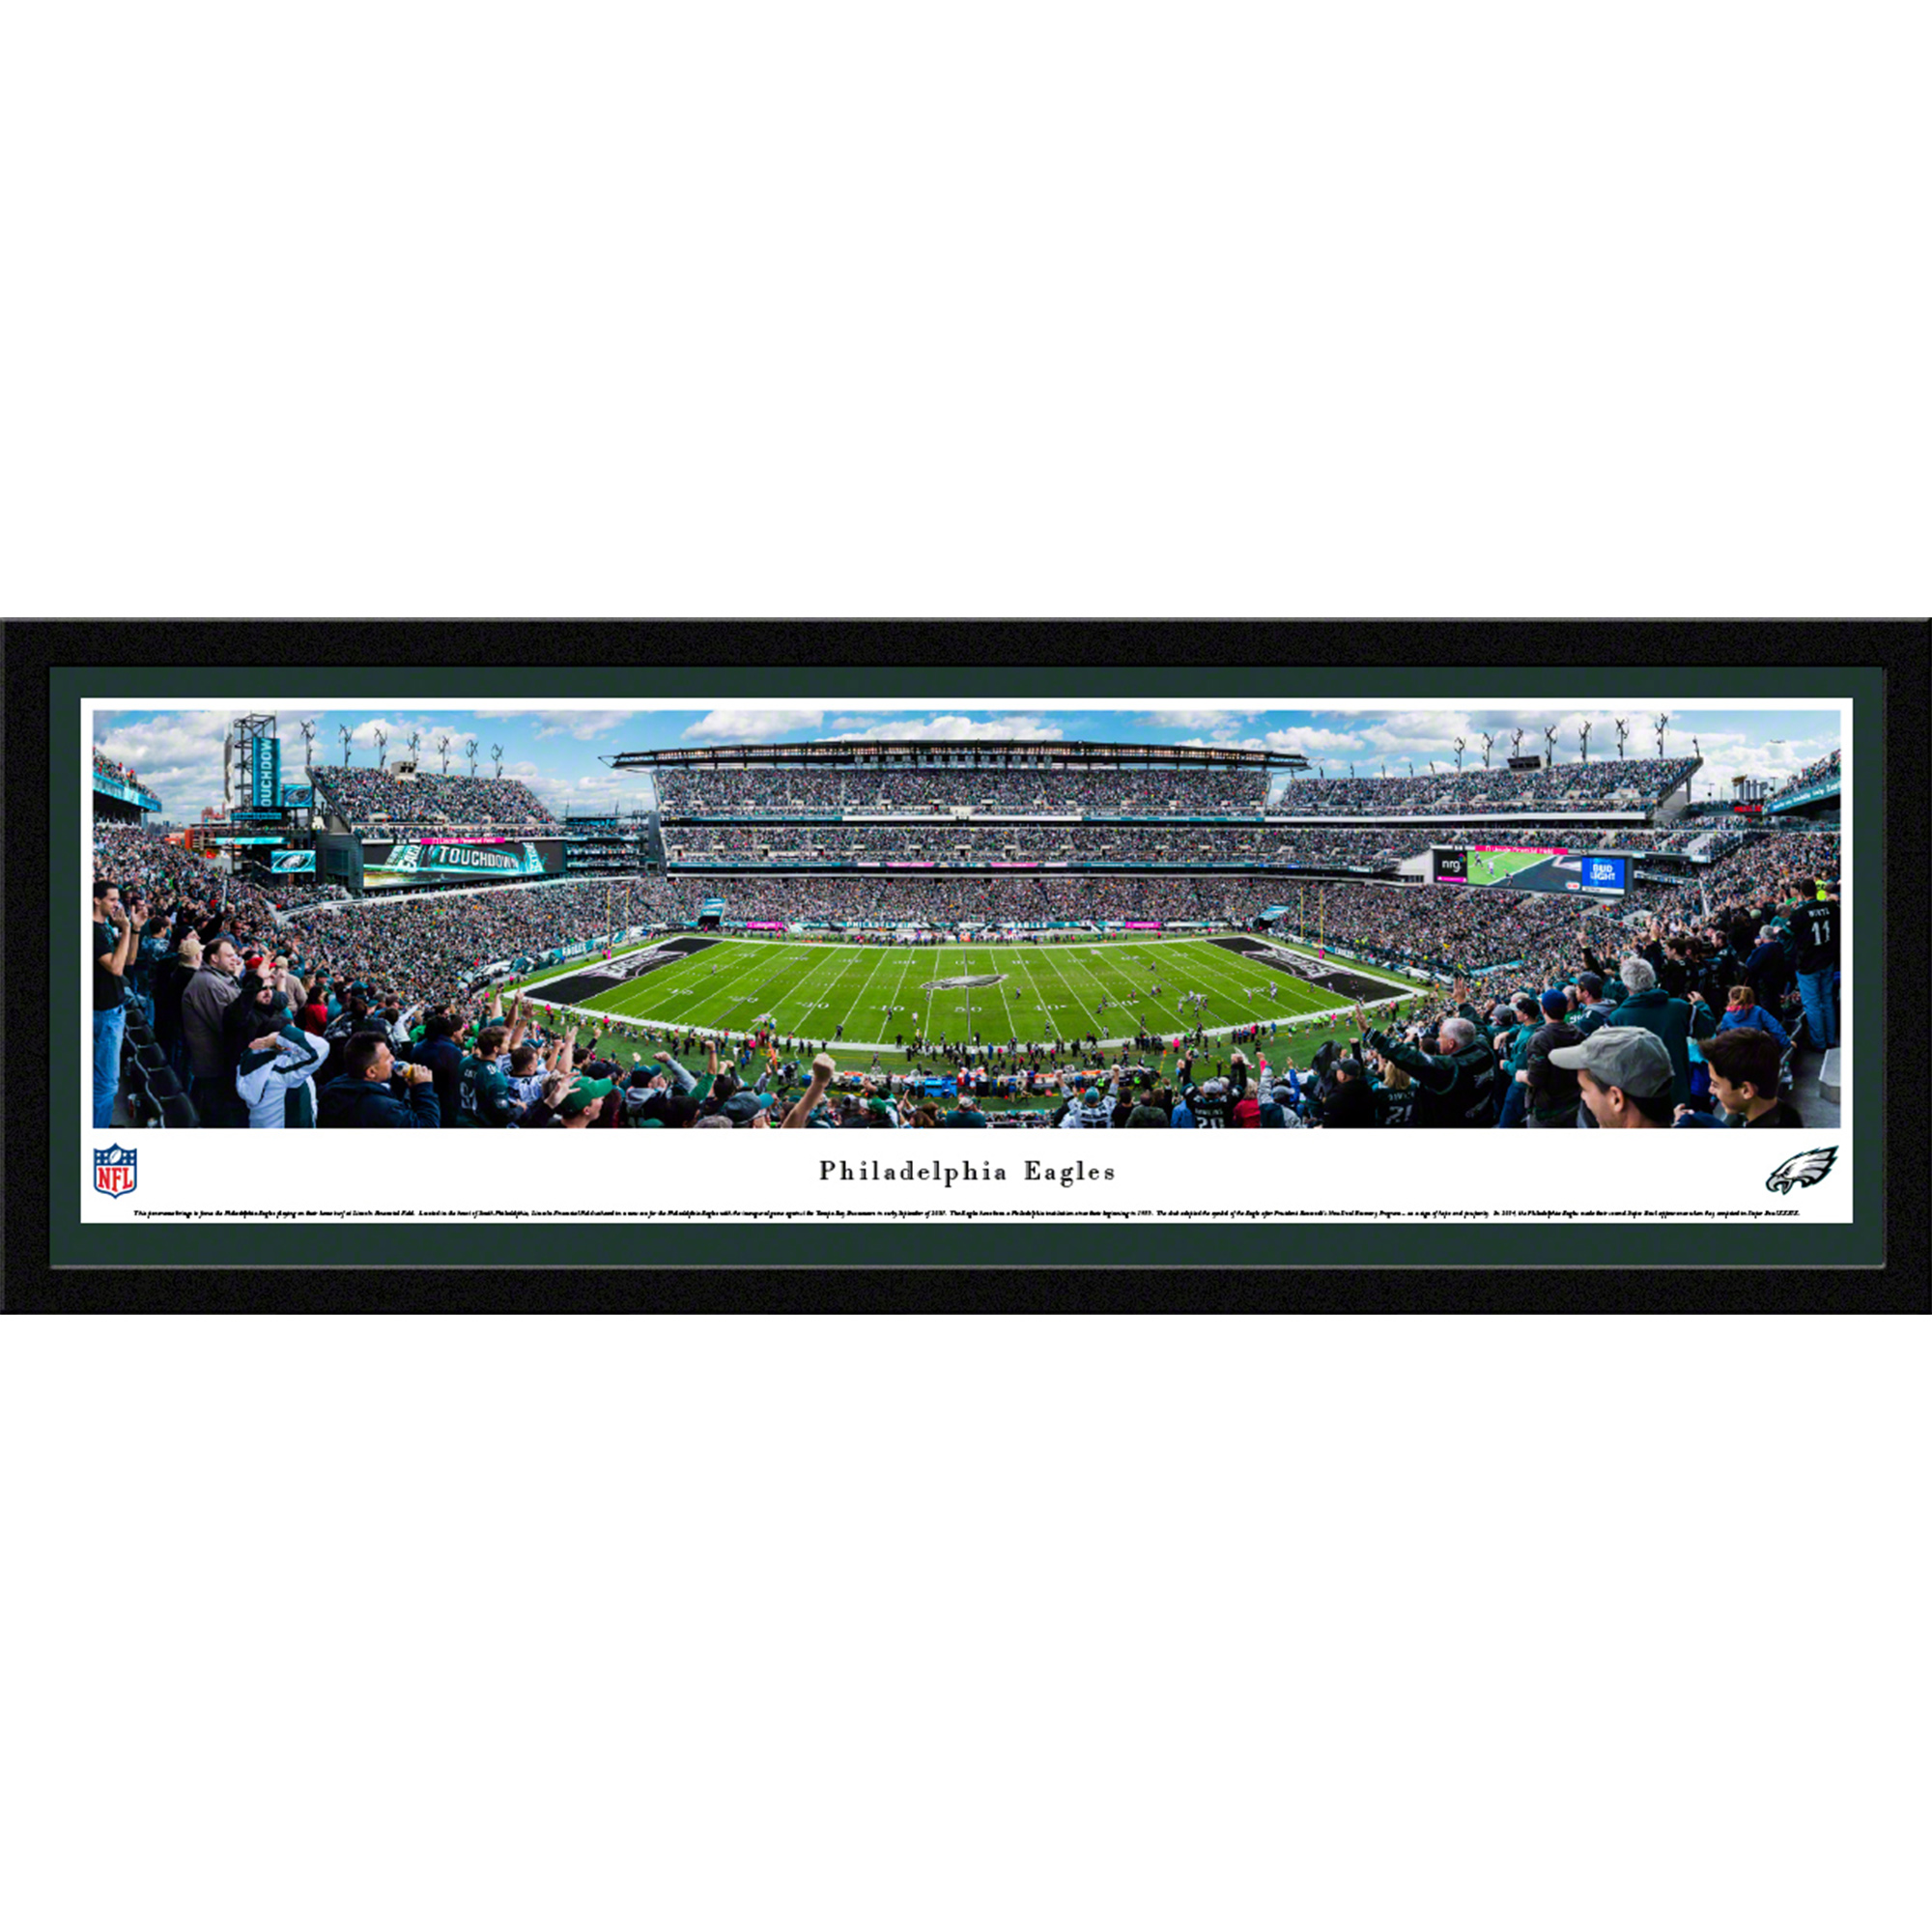 Philadelphia Eagles - 50 Yard Line - Blakeway Panoramas Prints with ...